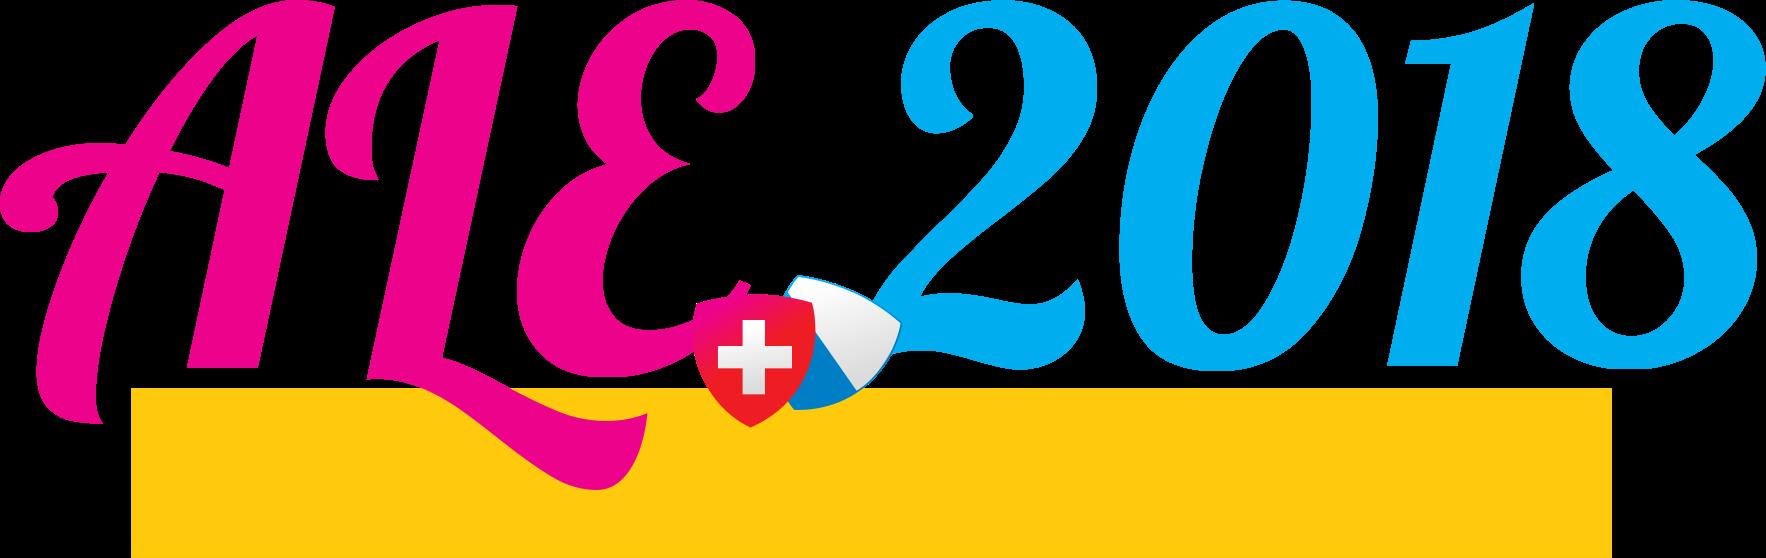 ale-2018-zurich-logo-midi-m